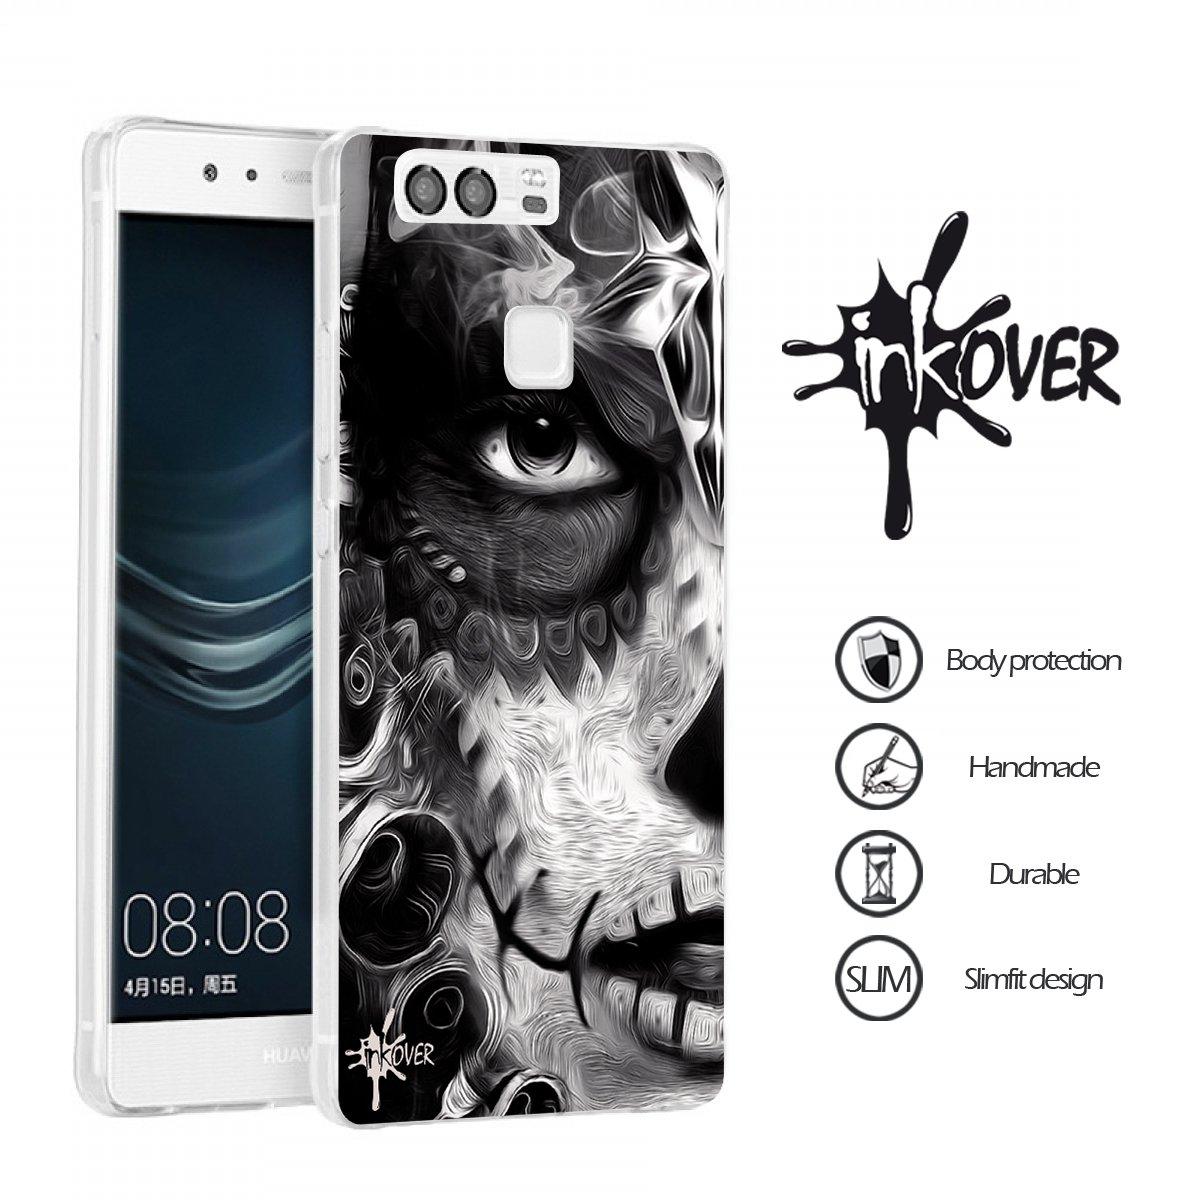 Funda Huawei P9 - INKOVER - Funda Carcasa Case Bumper Protección ...